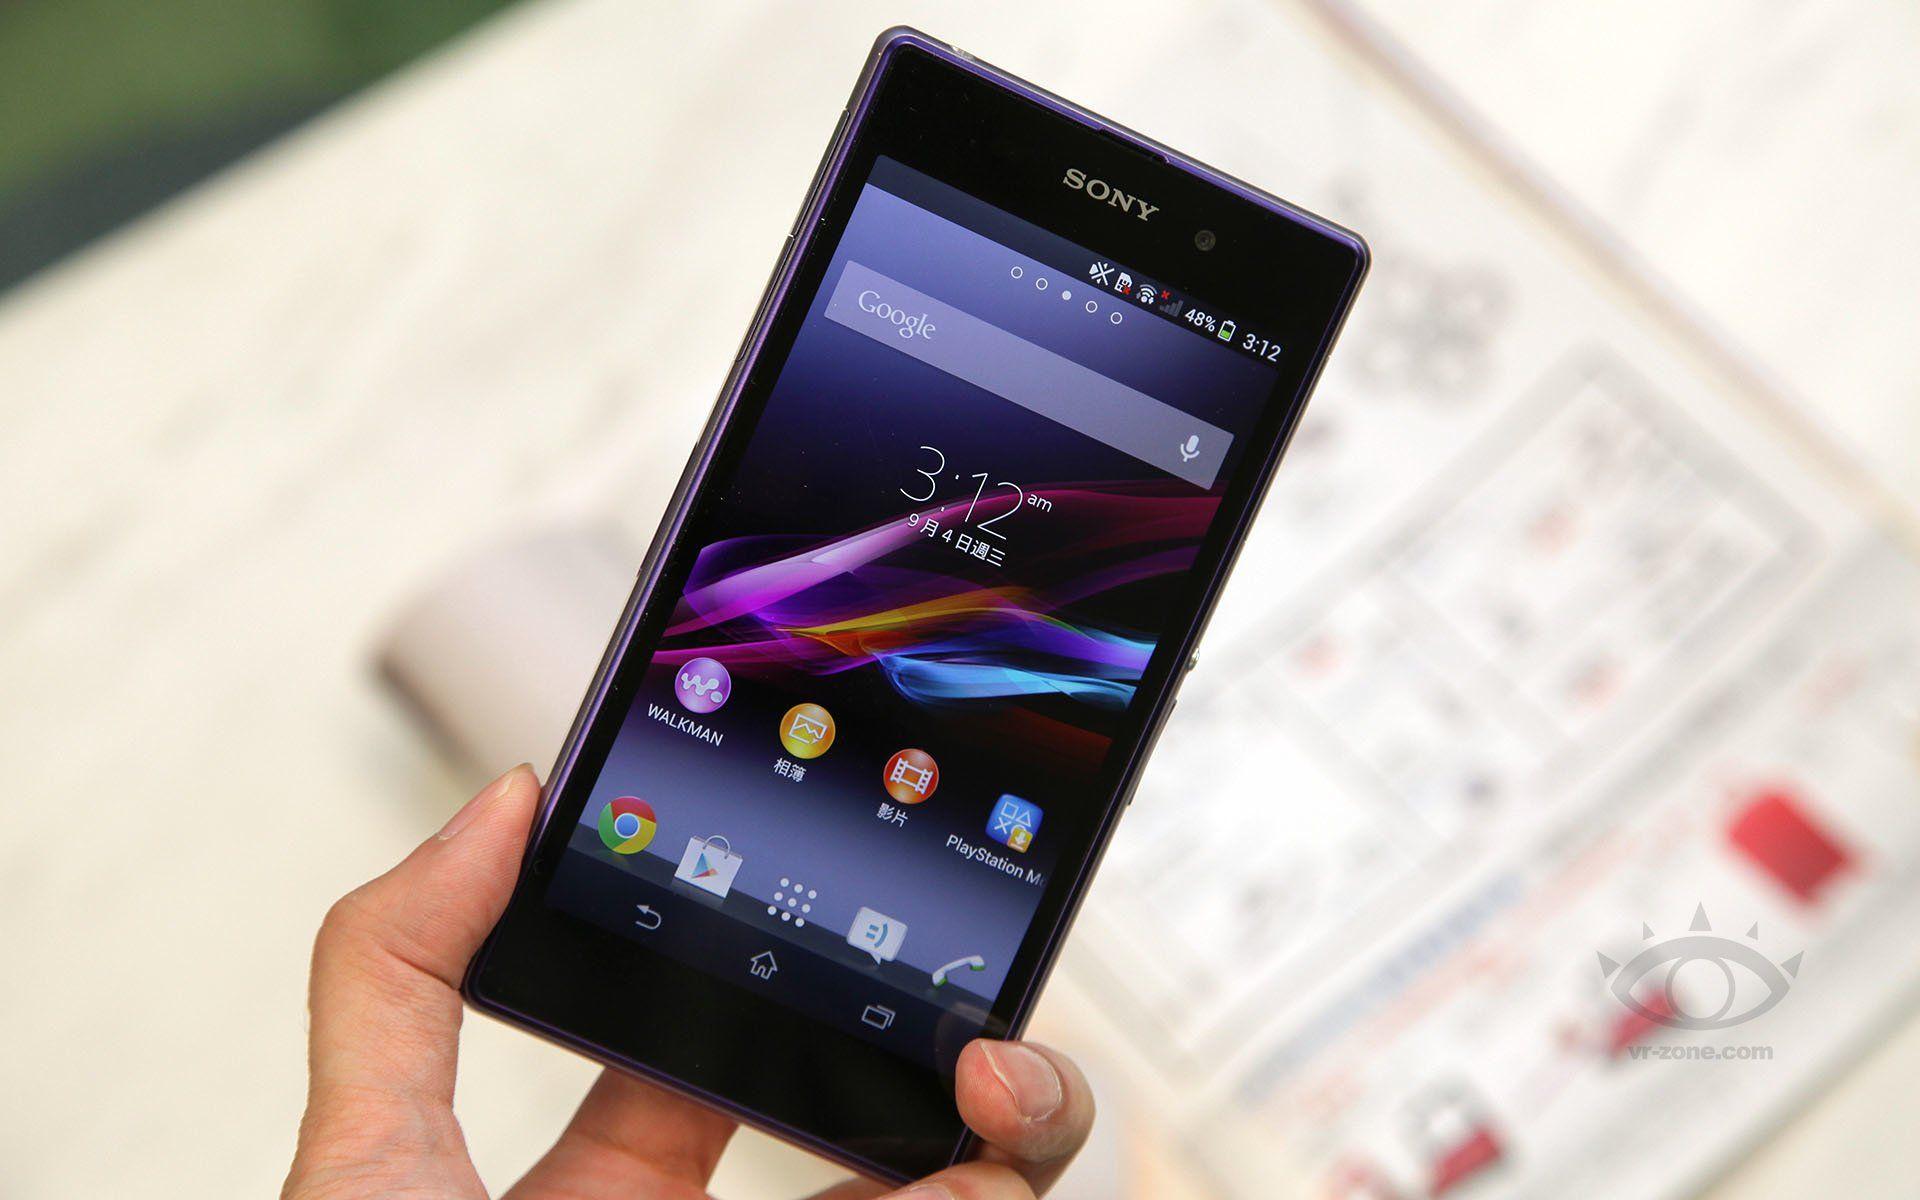 享受 Android 4.3 Jelly Bean,Sony Xperia Z1 與  Z Ultra 開始獲得更新 - http://chinese.vr-zone.com/94665/sony-xperia-z1-z-ultra-starts-to-update-to-android-4-3-jelly-bean-14-2-a-0-290-12162013/